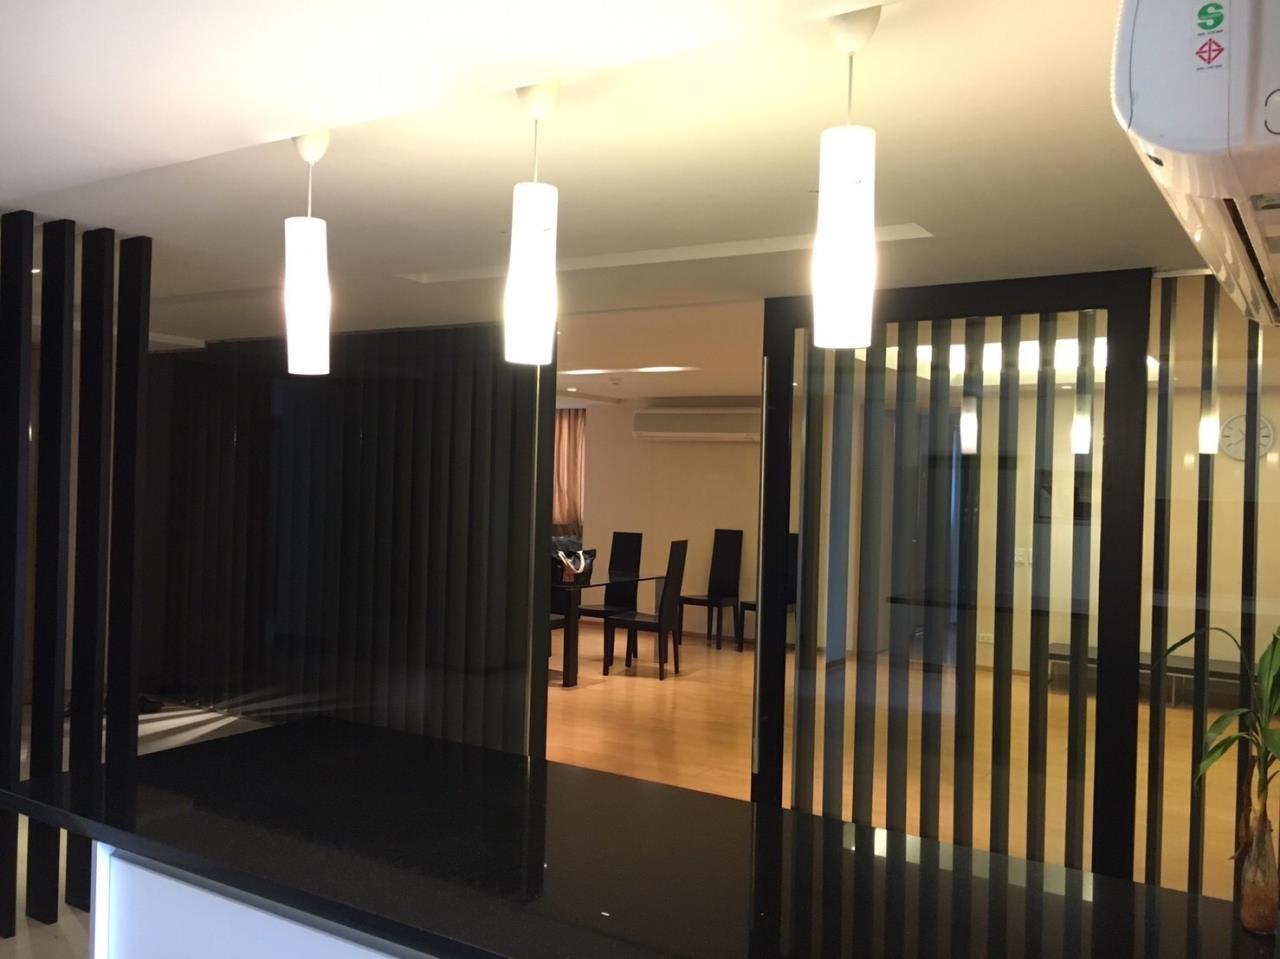 Piri Property Agency's Duplex Penthouse with 4 Bedrooms in Ekkamai - 27th Floor 4